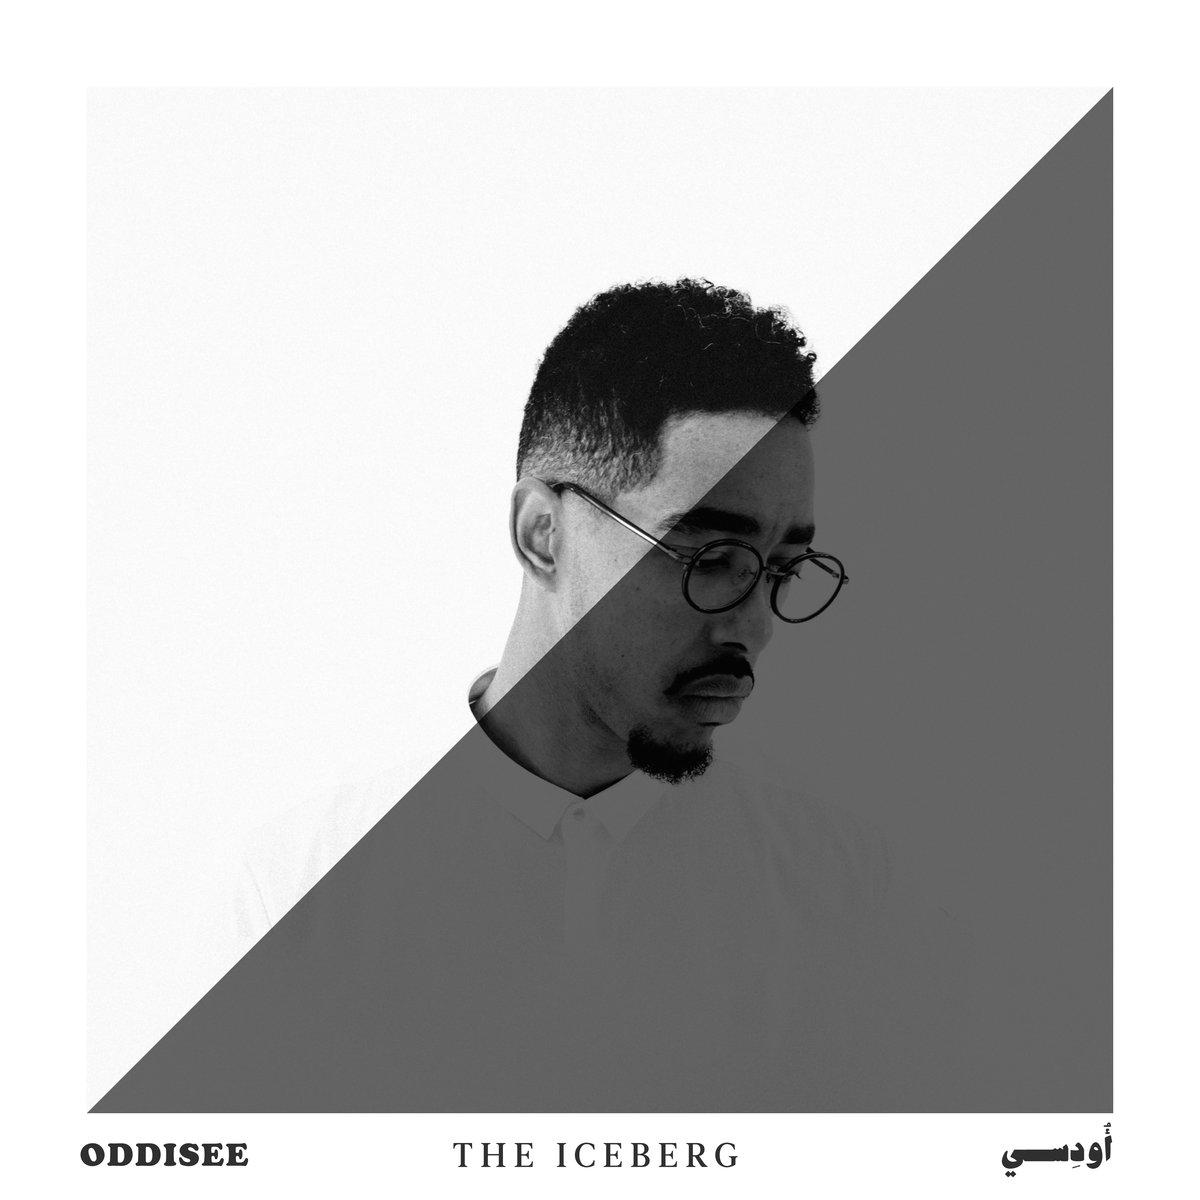 ODDISEE MONTRE UNE PARTIE DE L'ICEBERG